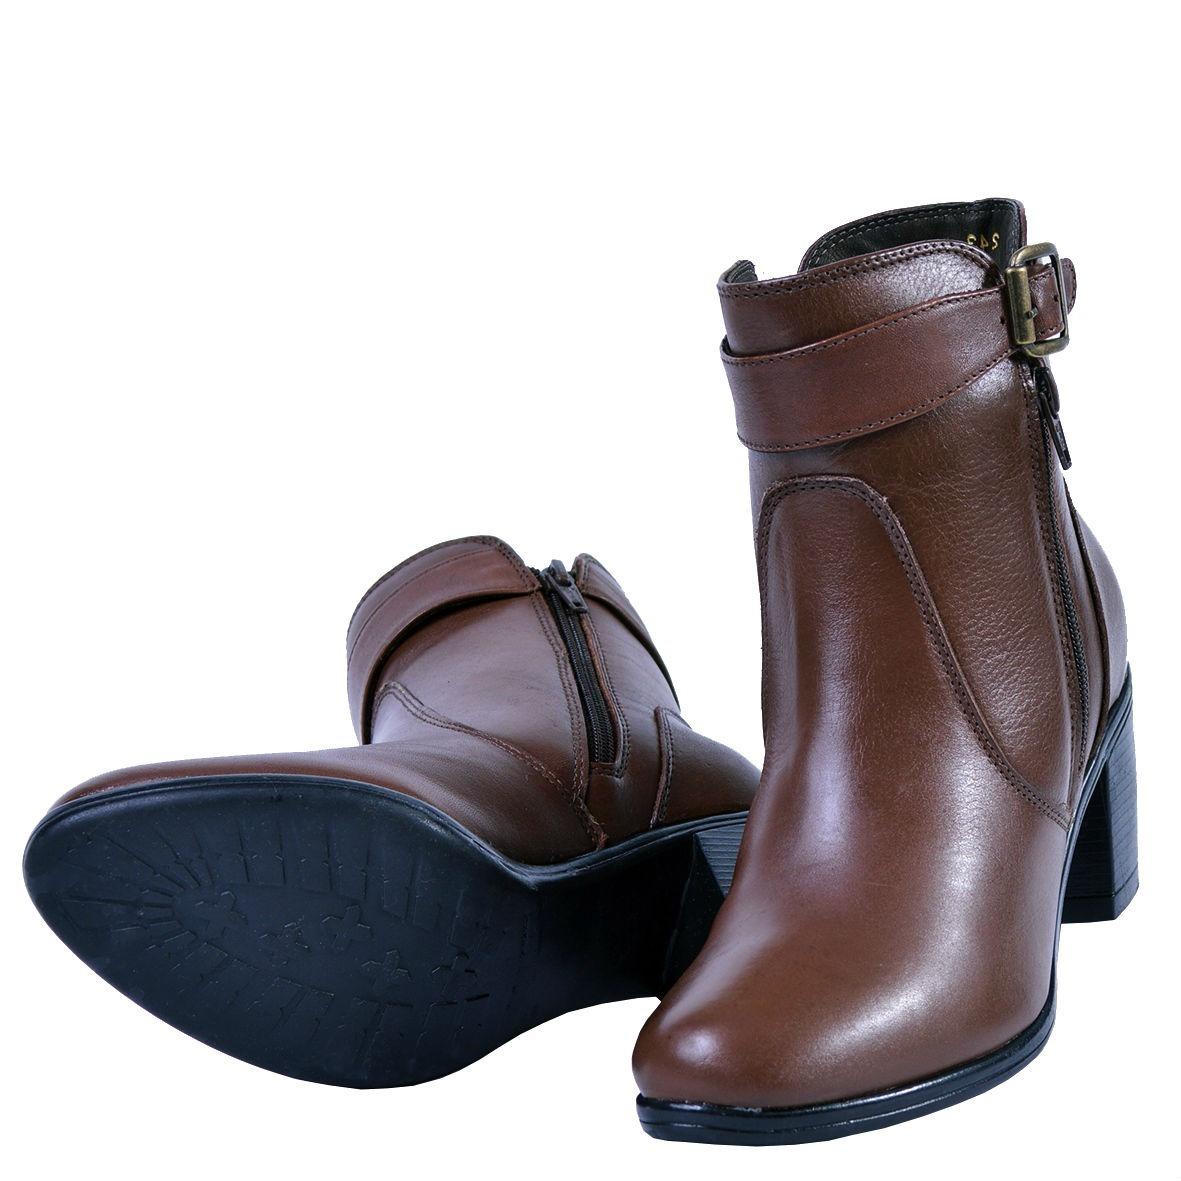 3ca00c9d56 coturno feminino bota cano curto couro marrom 243. Carregando zoom.